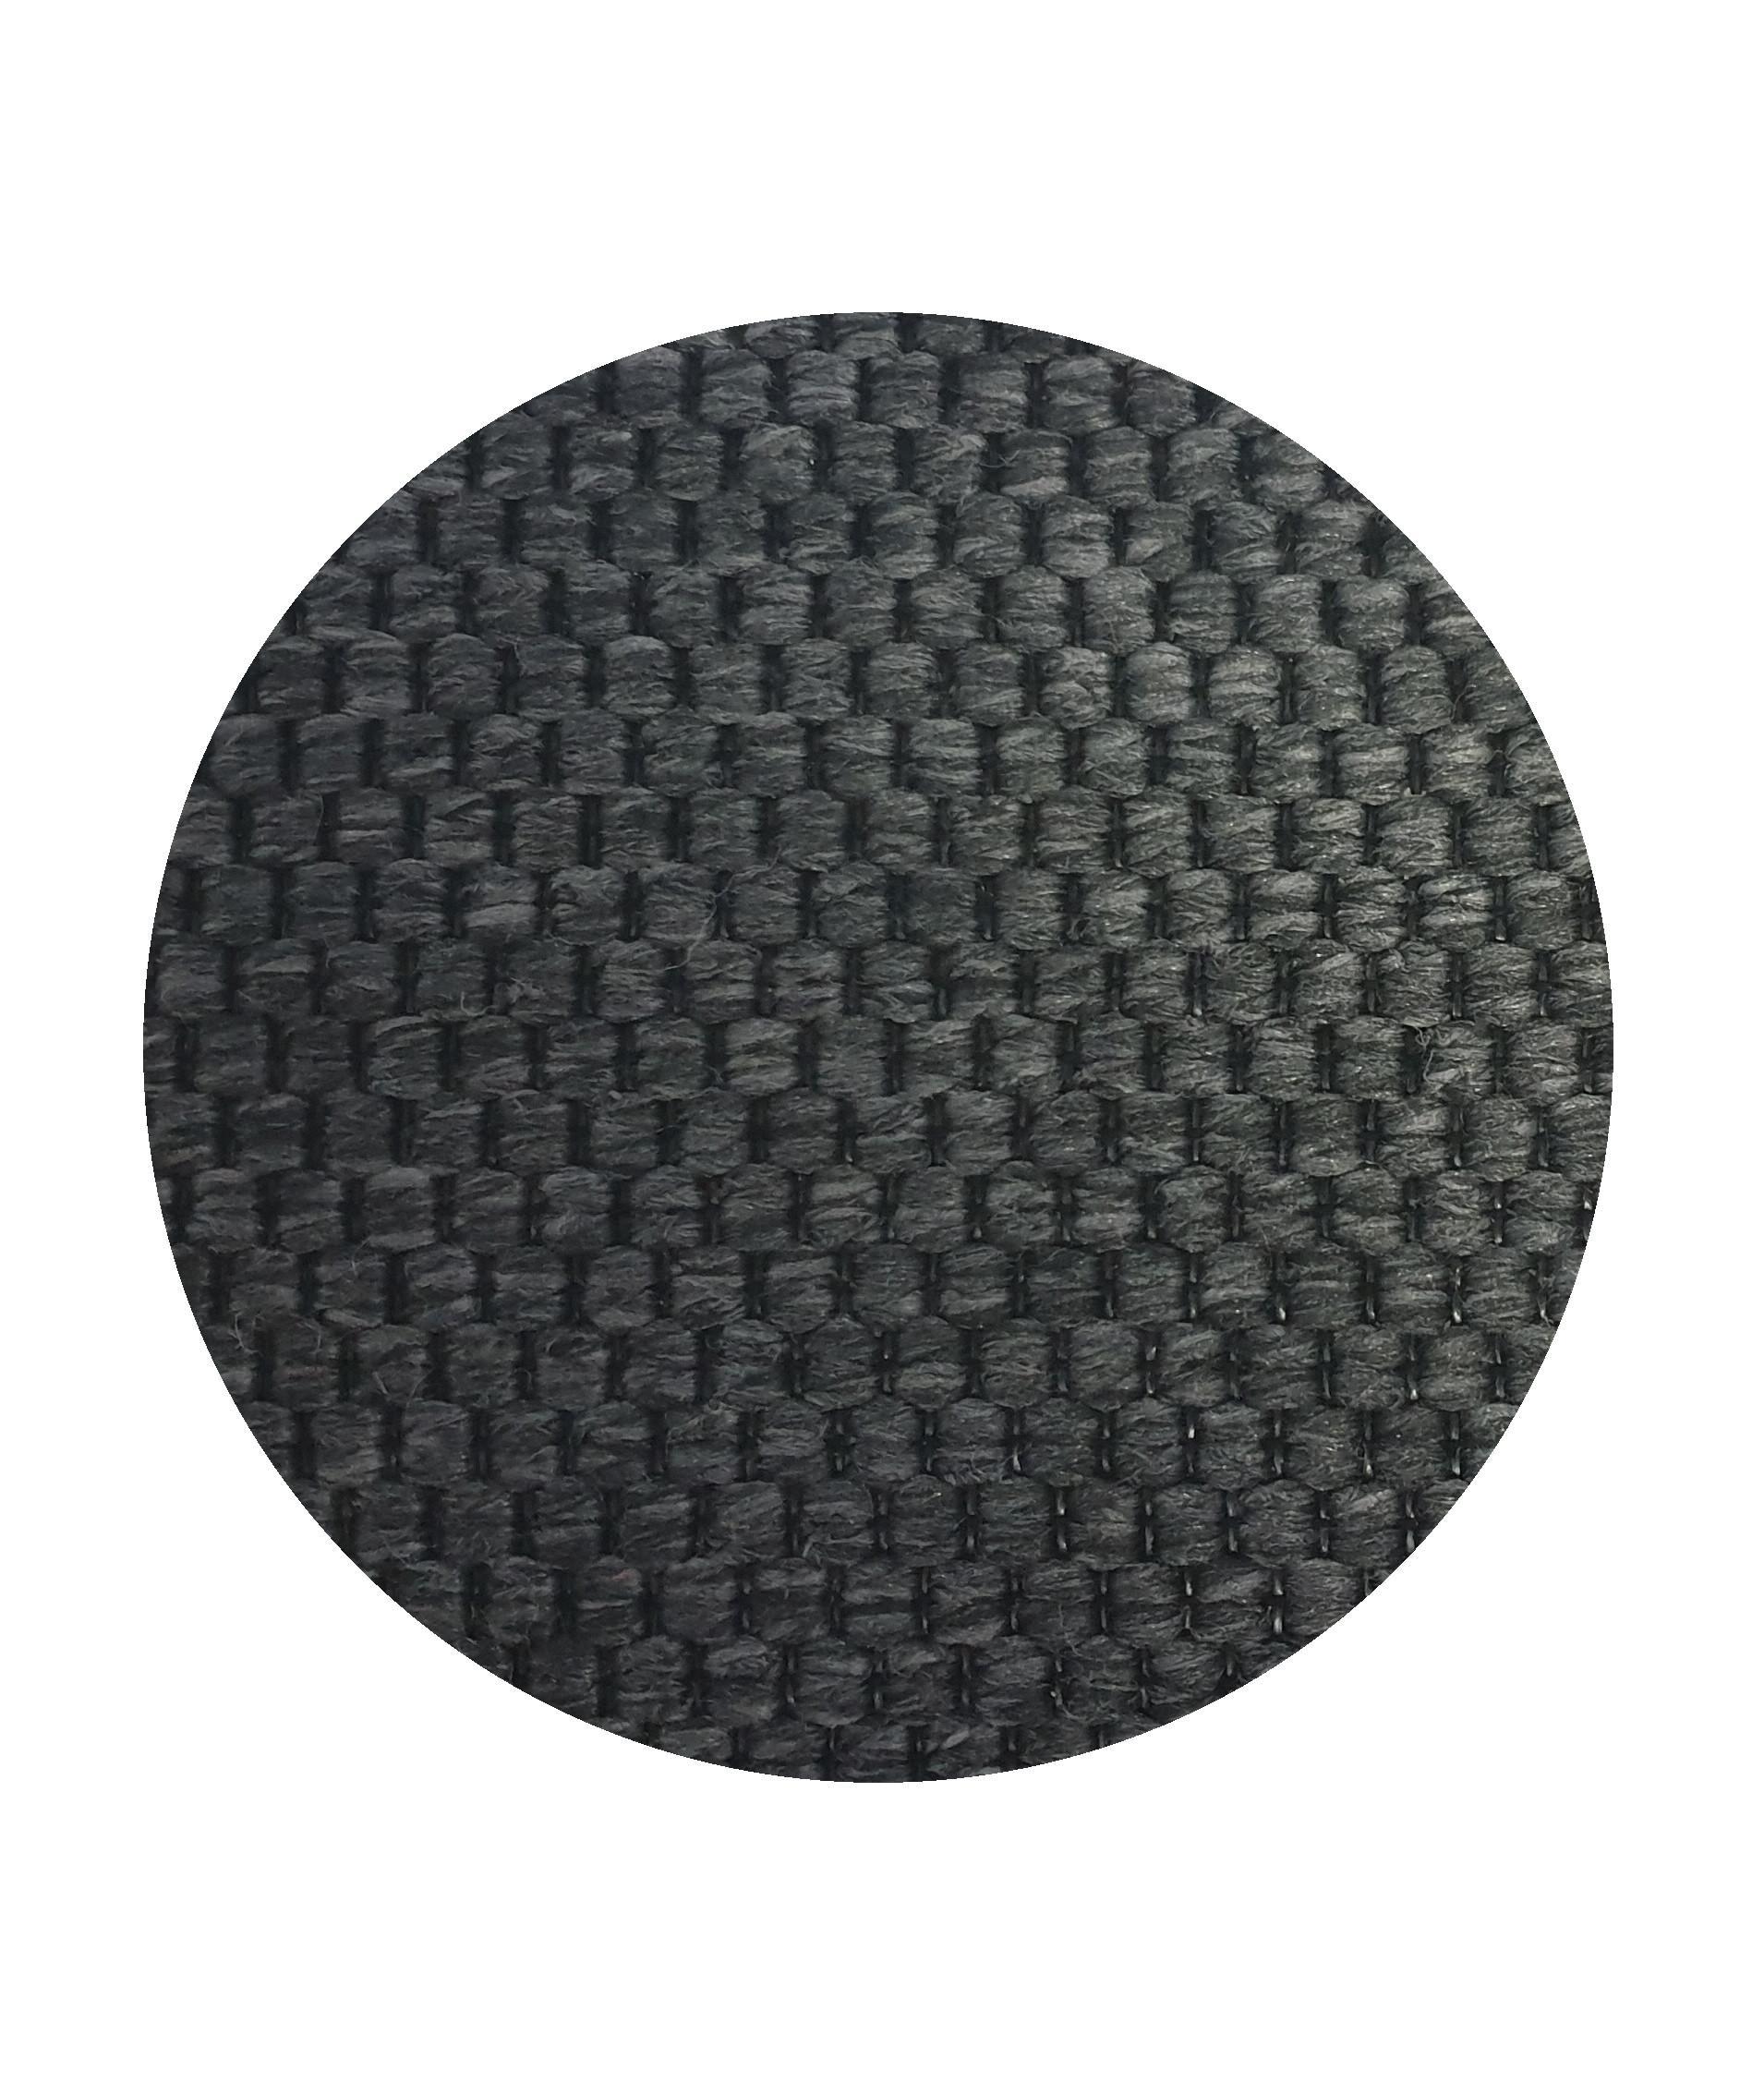 Vopi koberce Kusový koberec Nature antracit kulatý - 67x67 (průměr) kruh cm